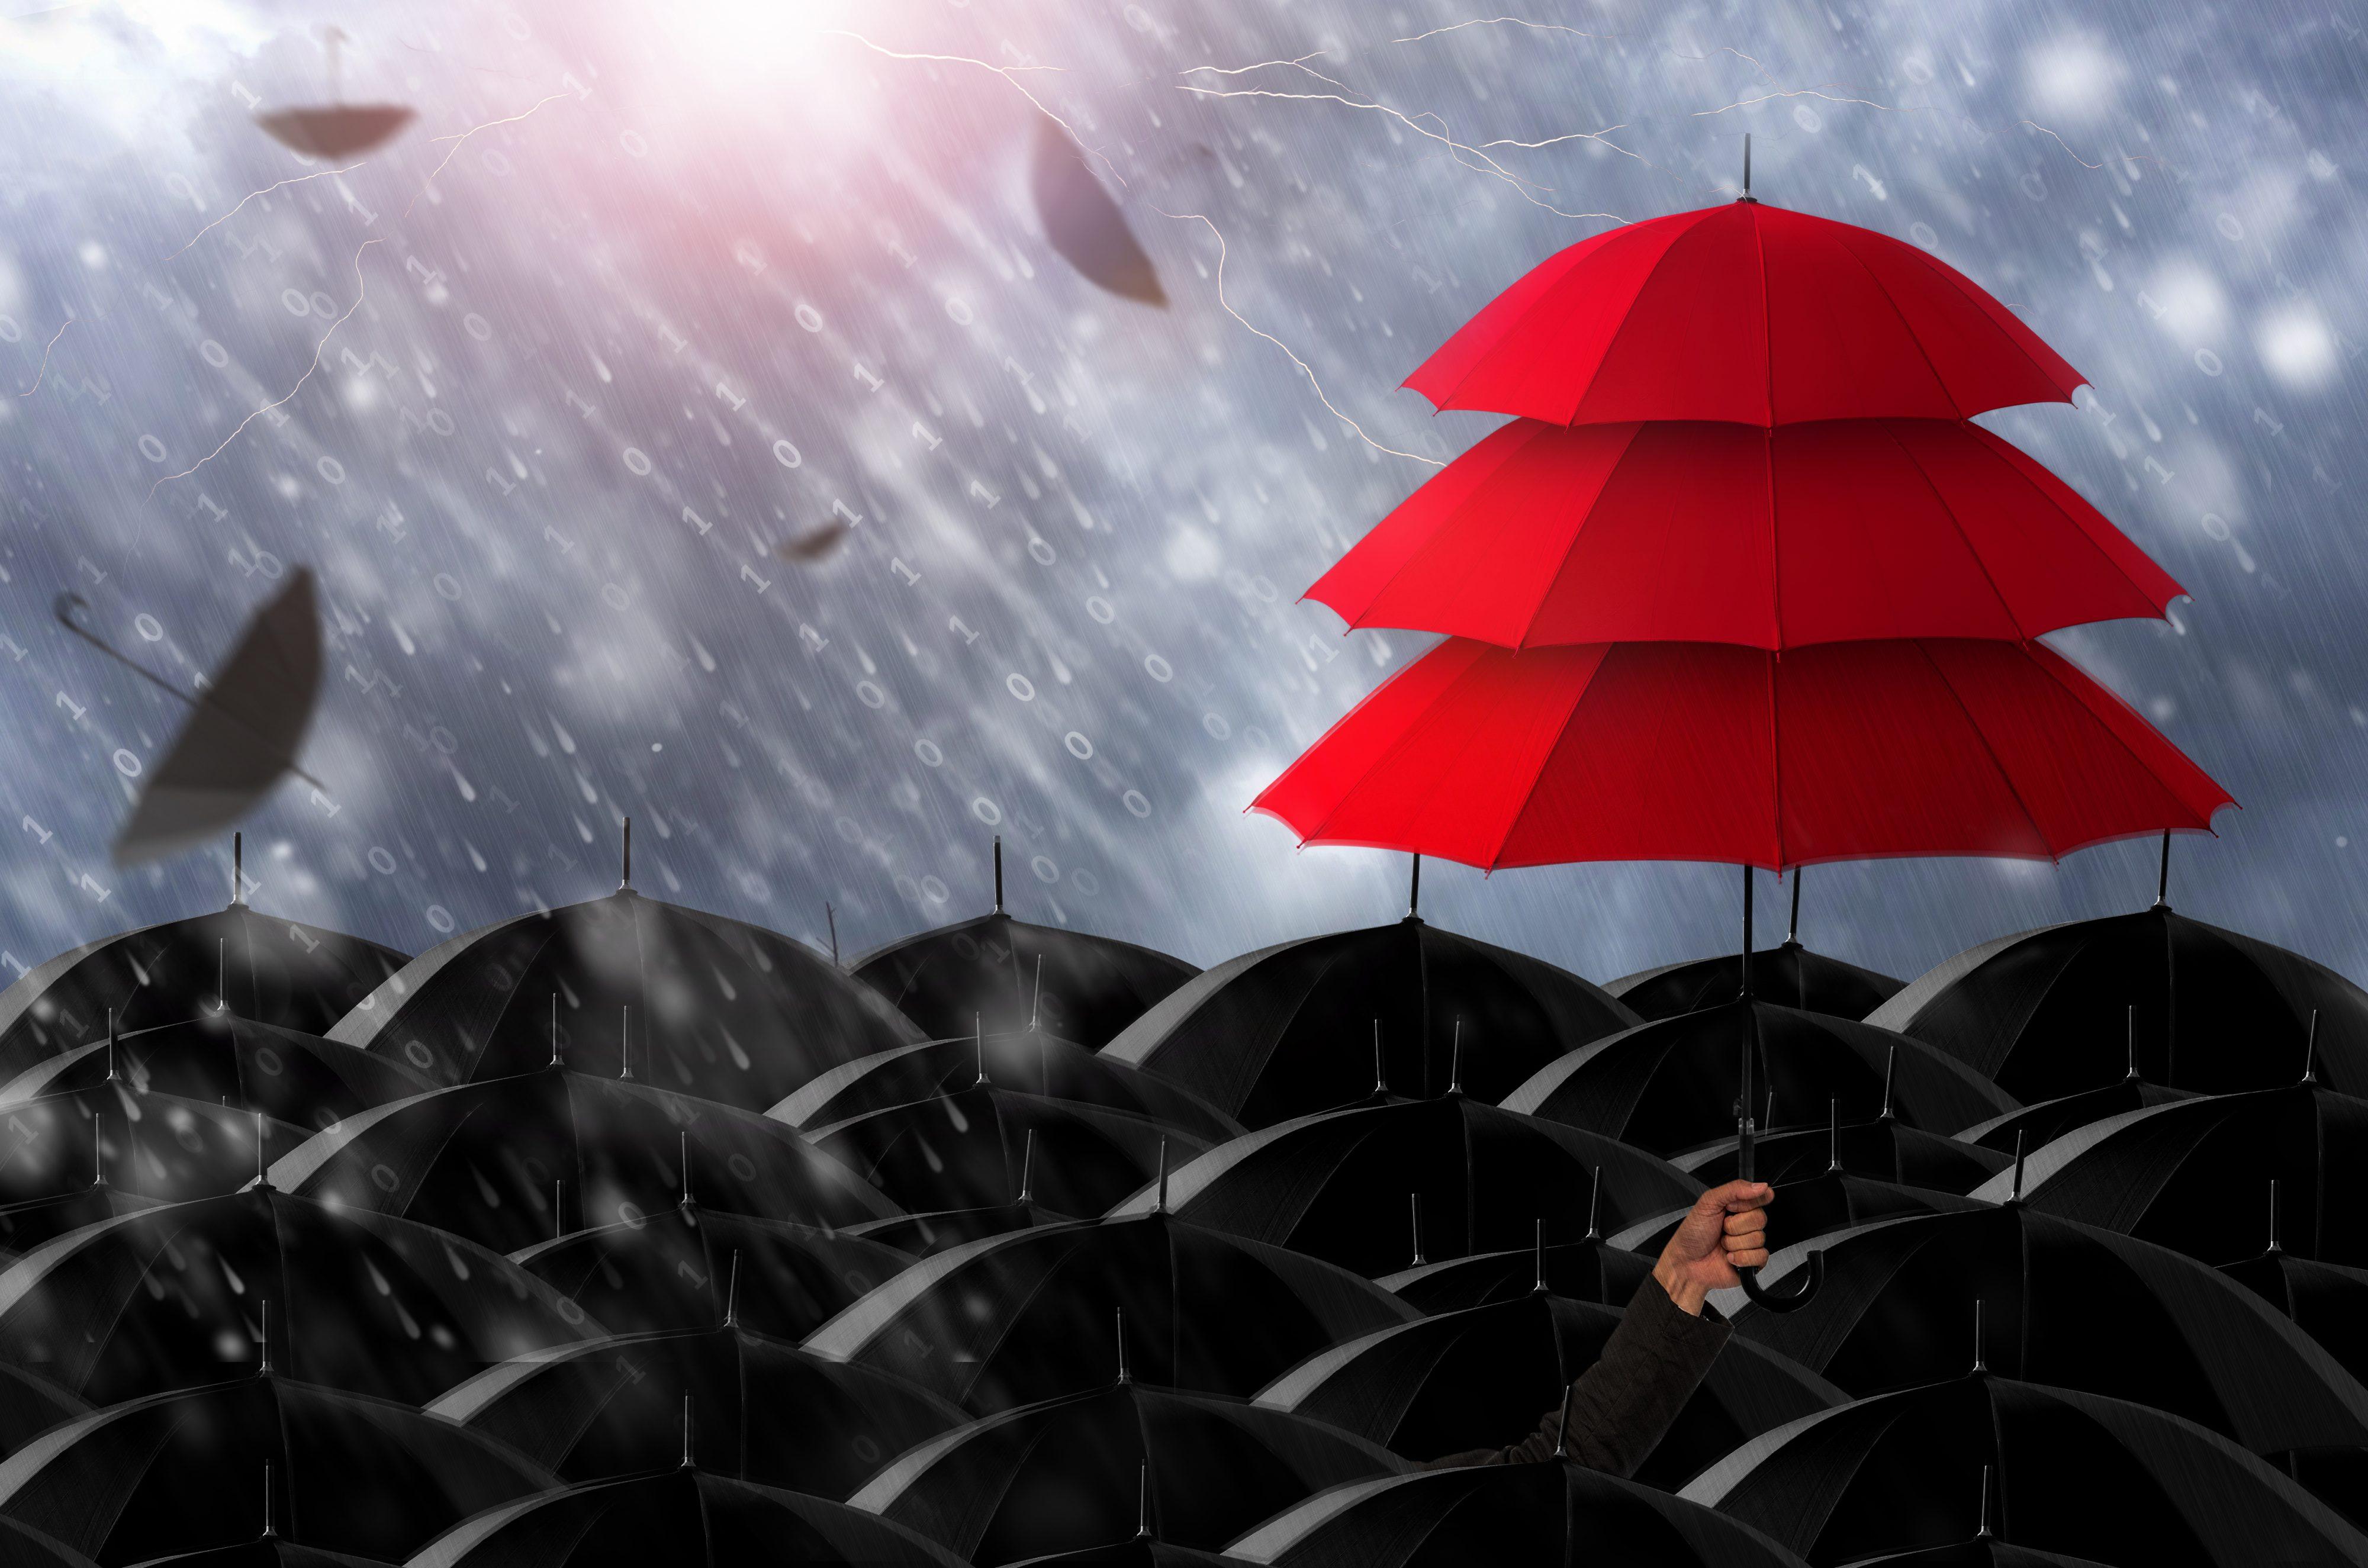 Stack of 3 red umbrellas above loads of black umbrellas in the rain.